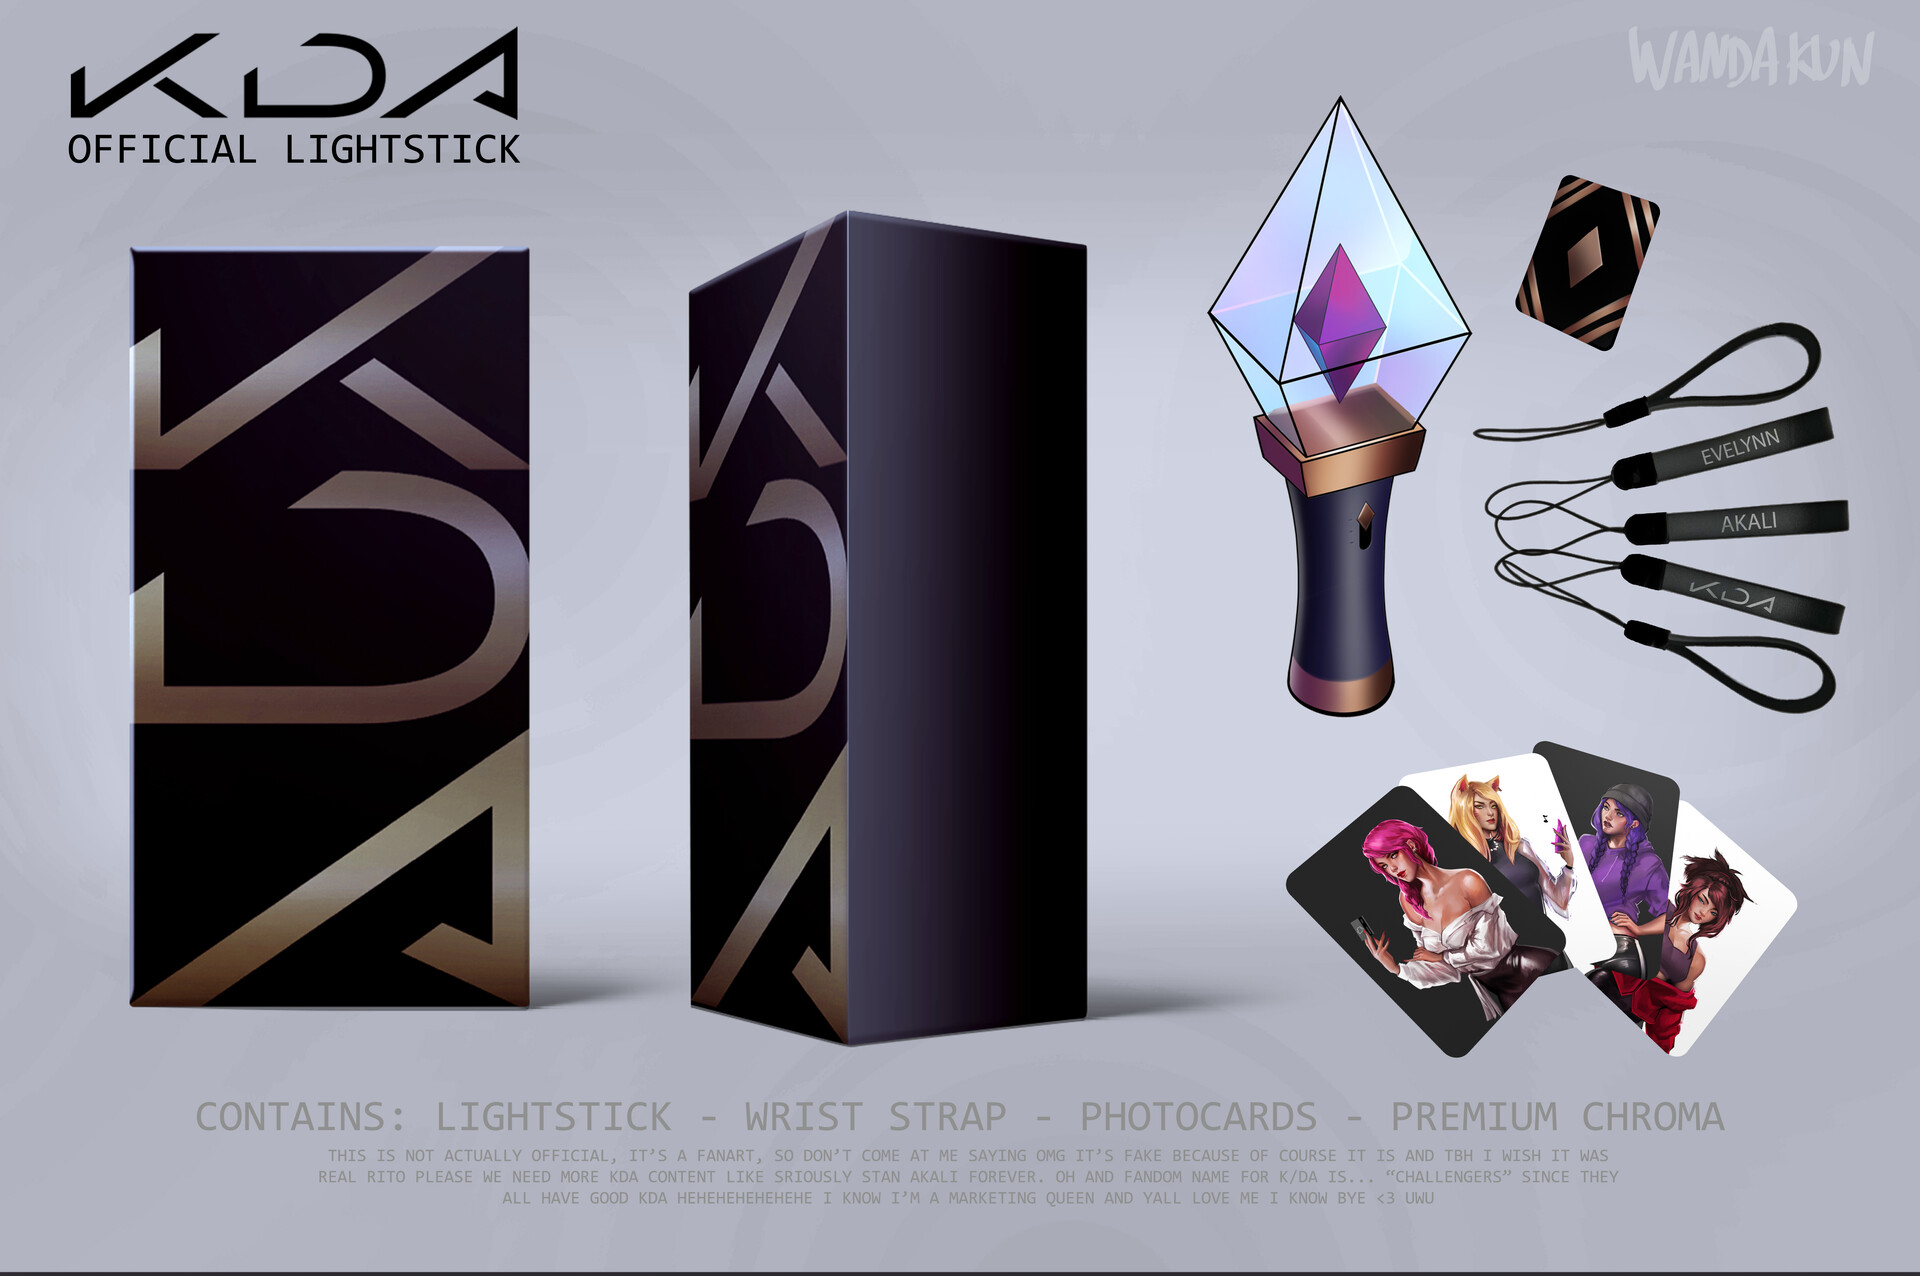 Artstation Kda Not Official Lightstick Fanart Concept Carmen Carballo Wandakun